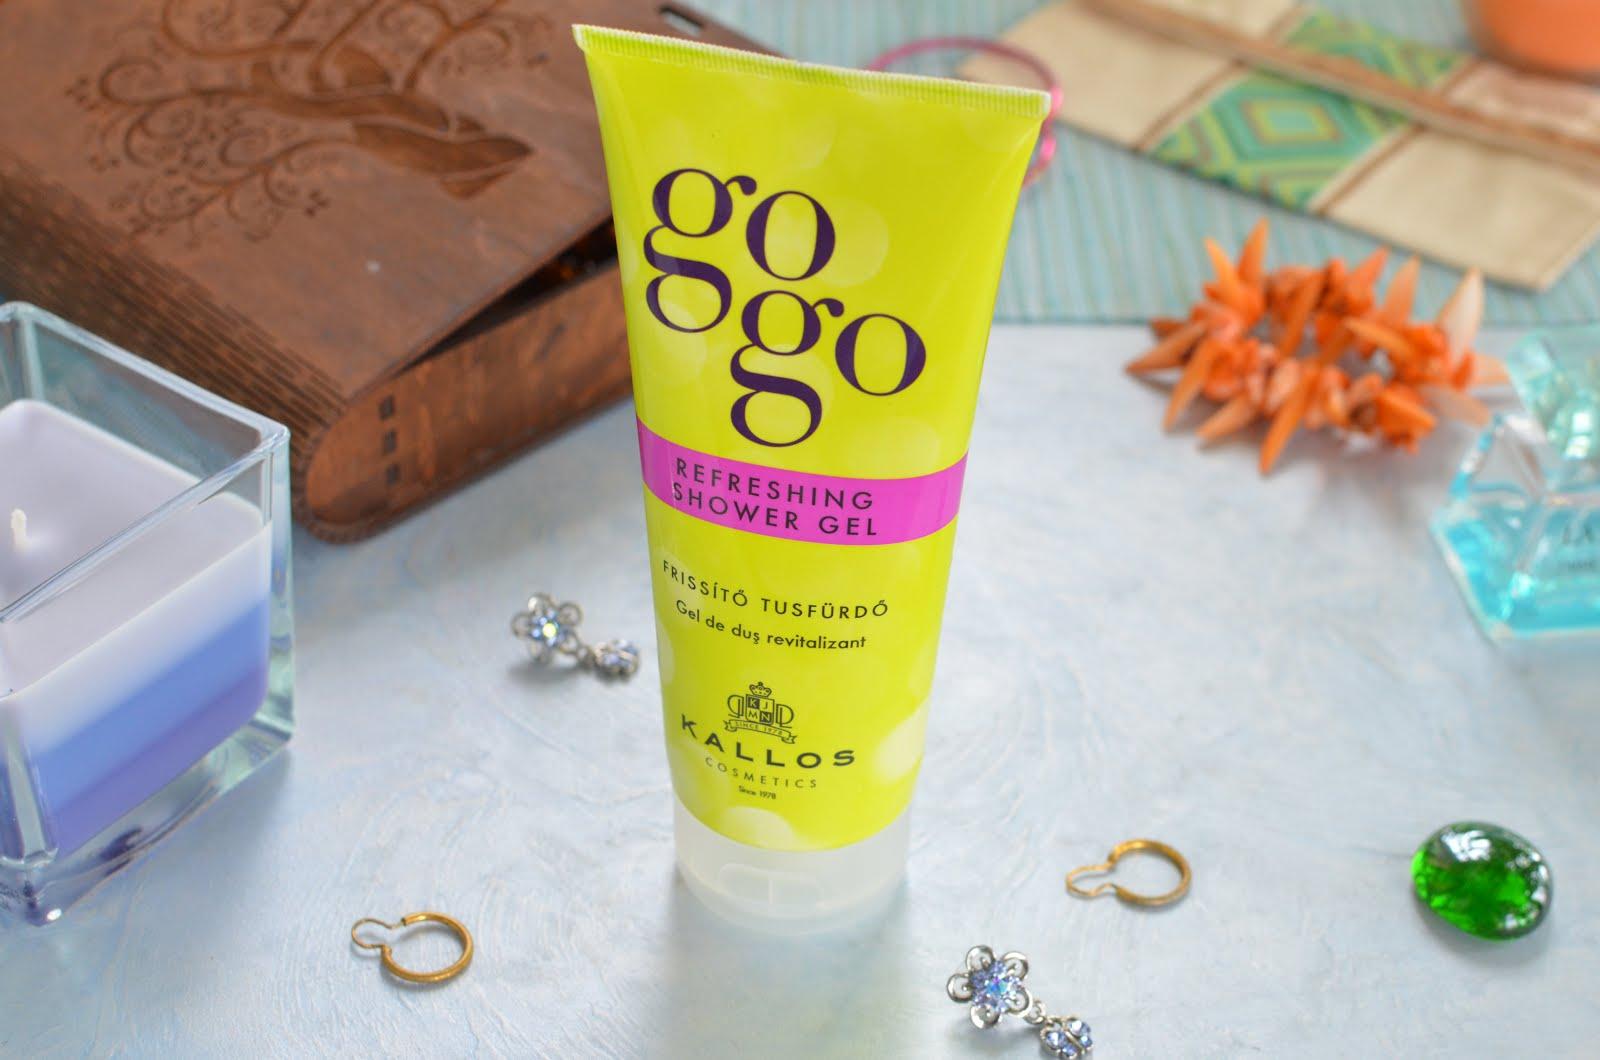 Kallos Cosmetics Gogo Refreshing Shower Gel Освежающий гель для душа